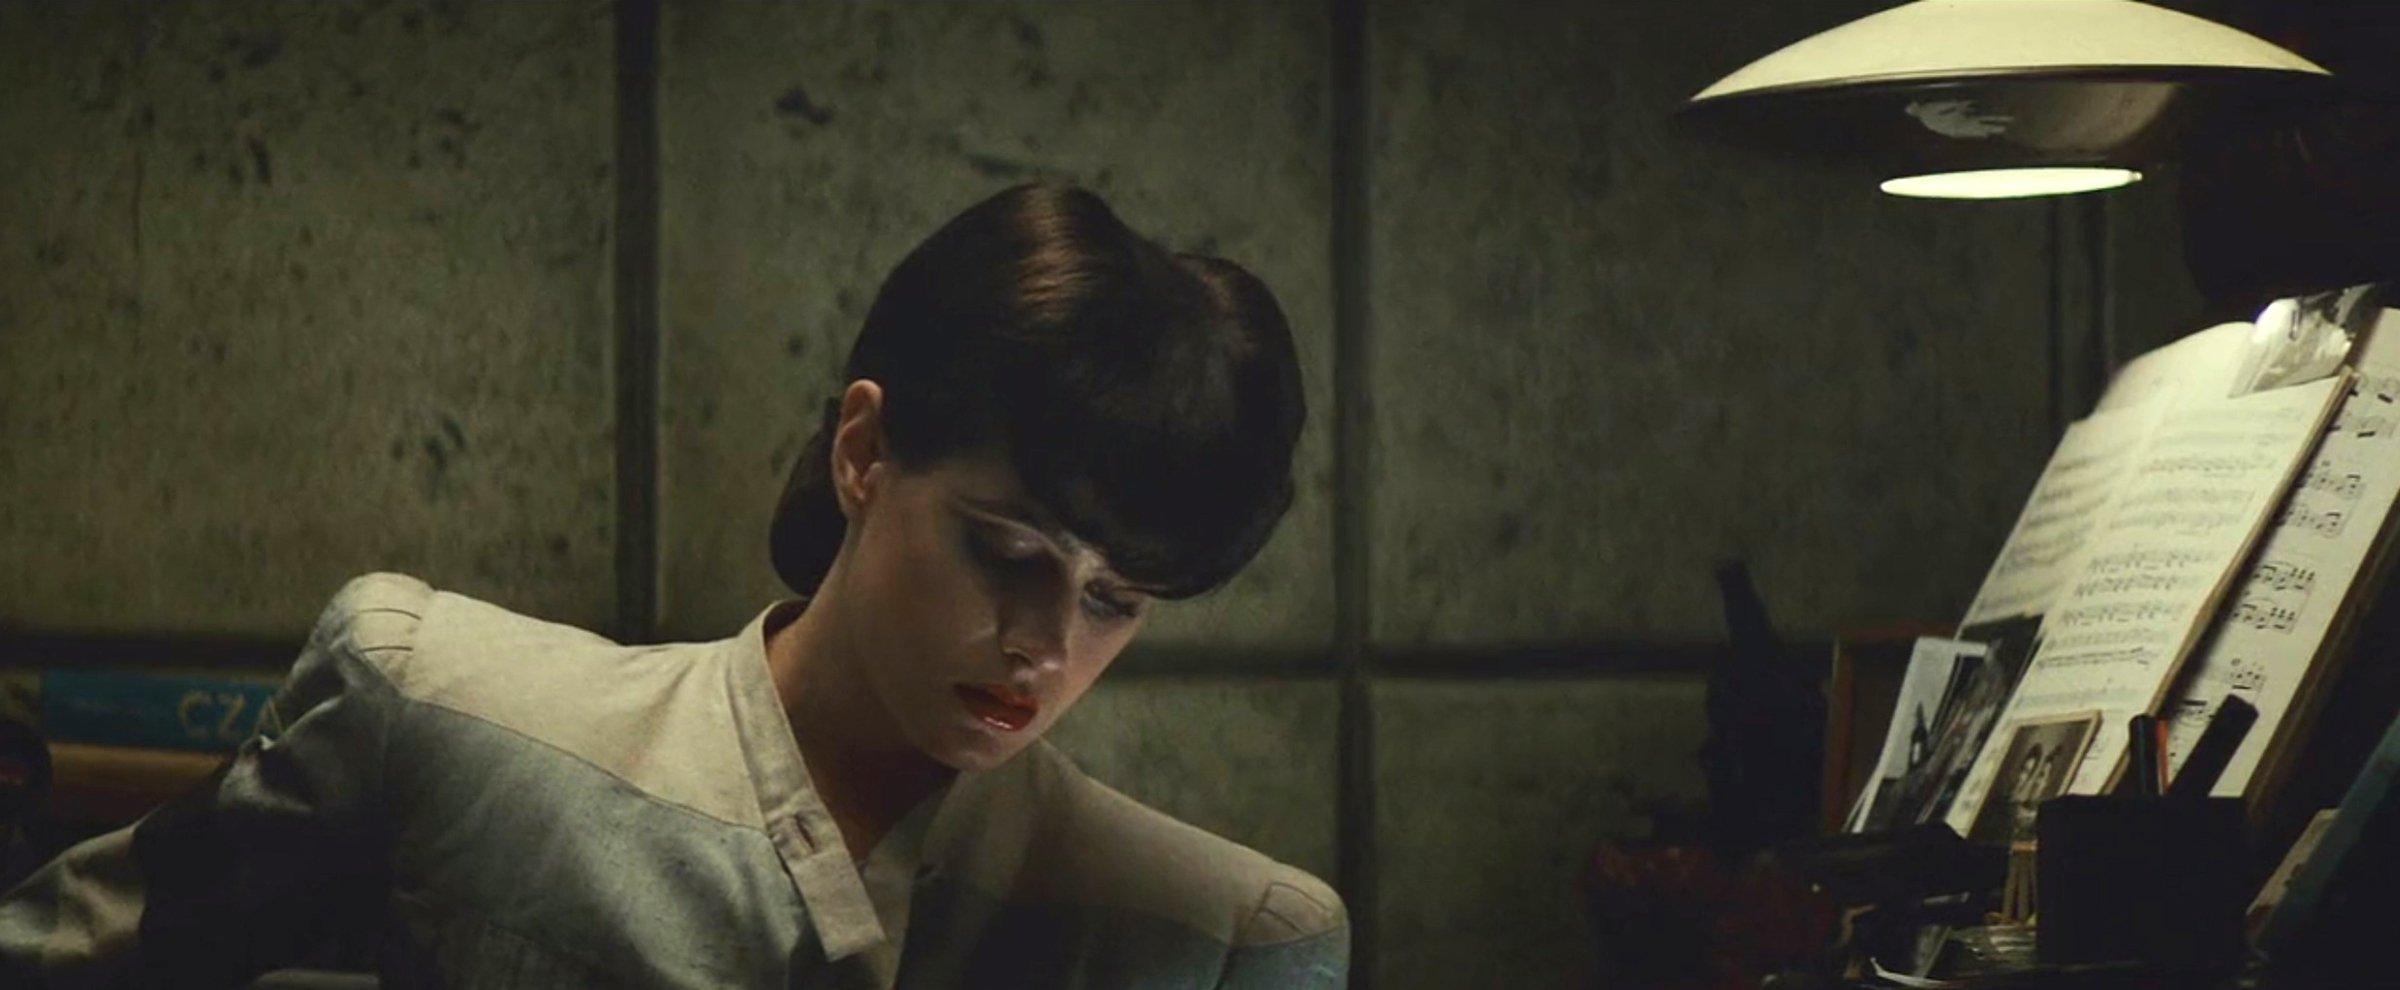 2. Бегущий по лезвию Blade Runner (1982), операторДжордан Кроненвет (режиссер Ридли Скотт)